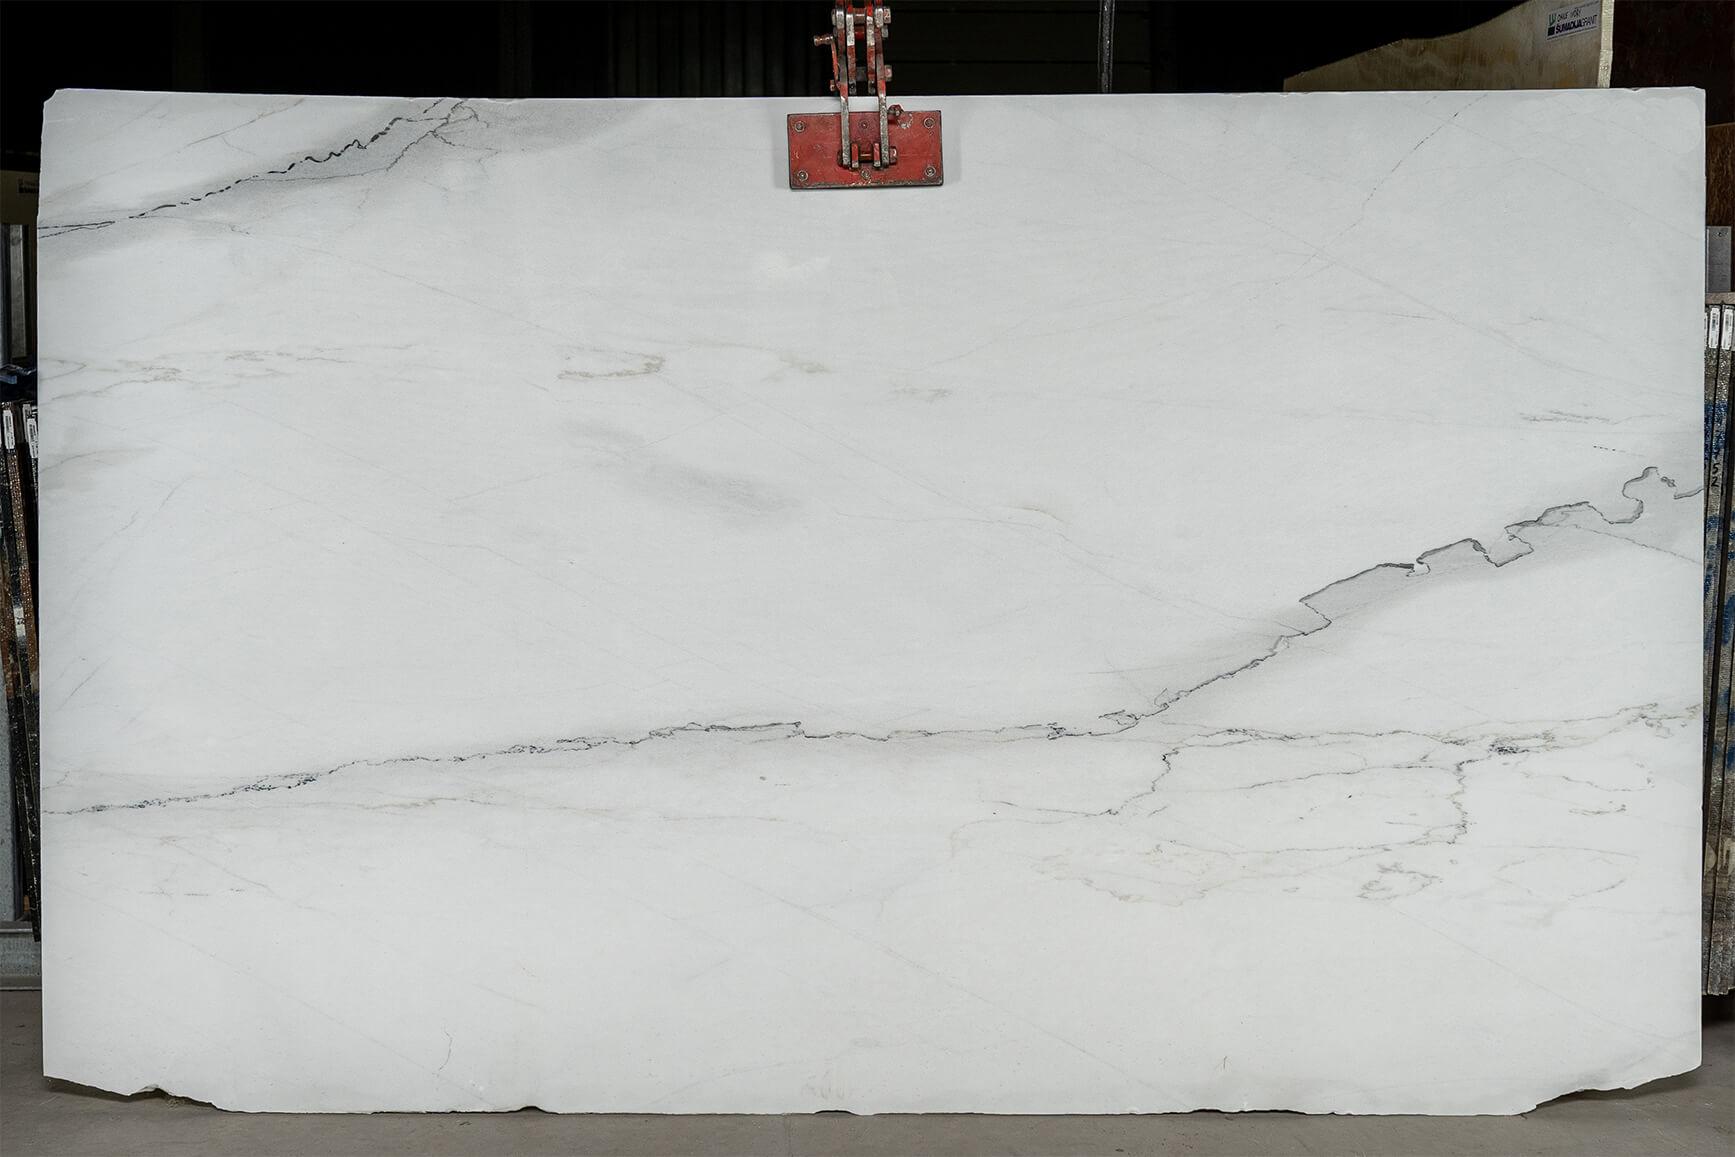 Colorado White